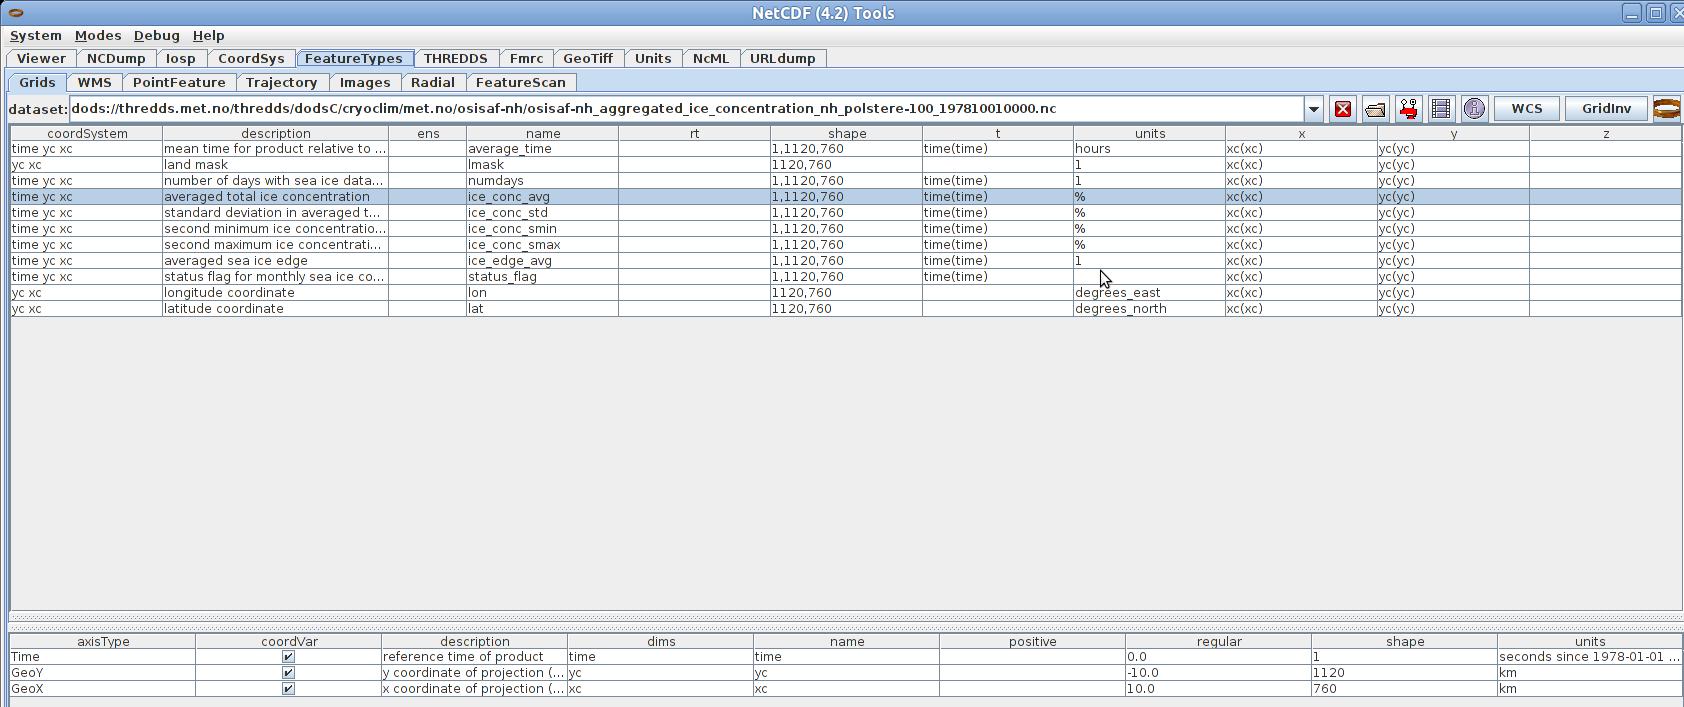 Download data | NORMAP